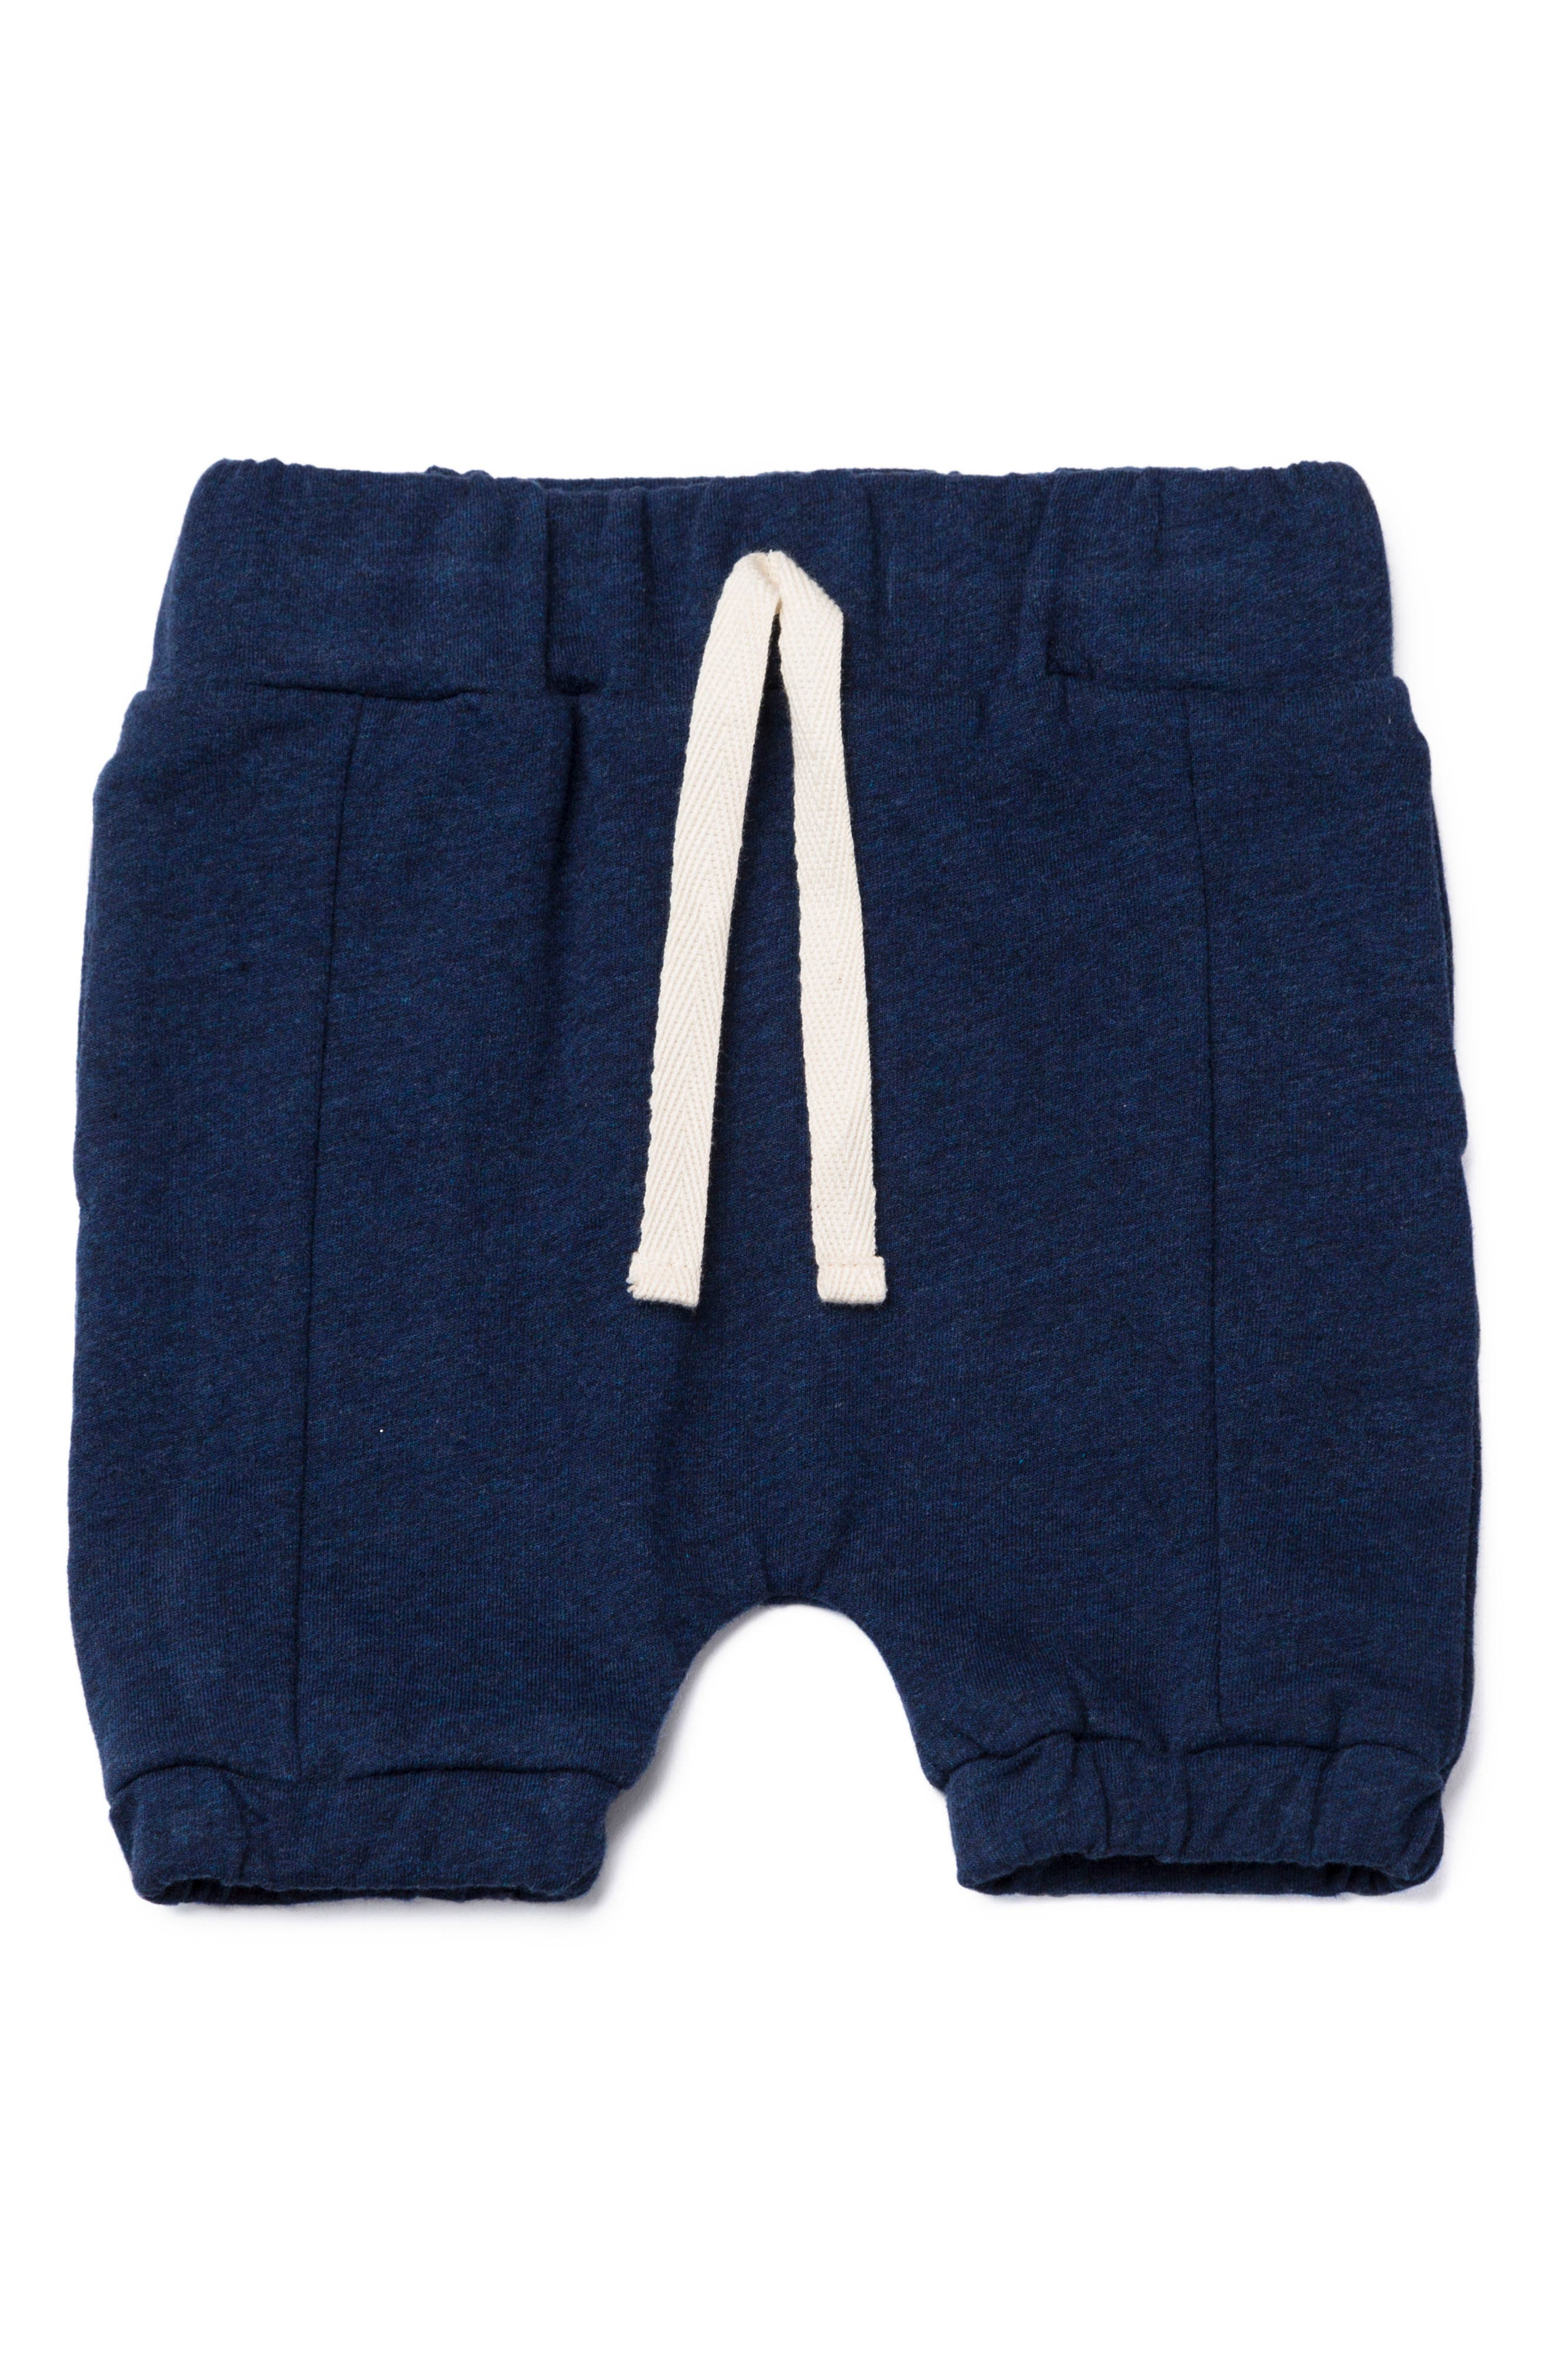 Monica + Andy Beach Organic Cotton Jogger Pants (Toddler Boys)